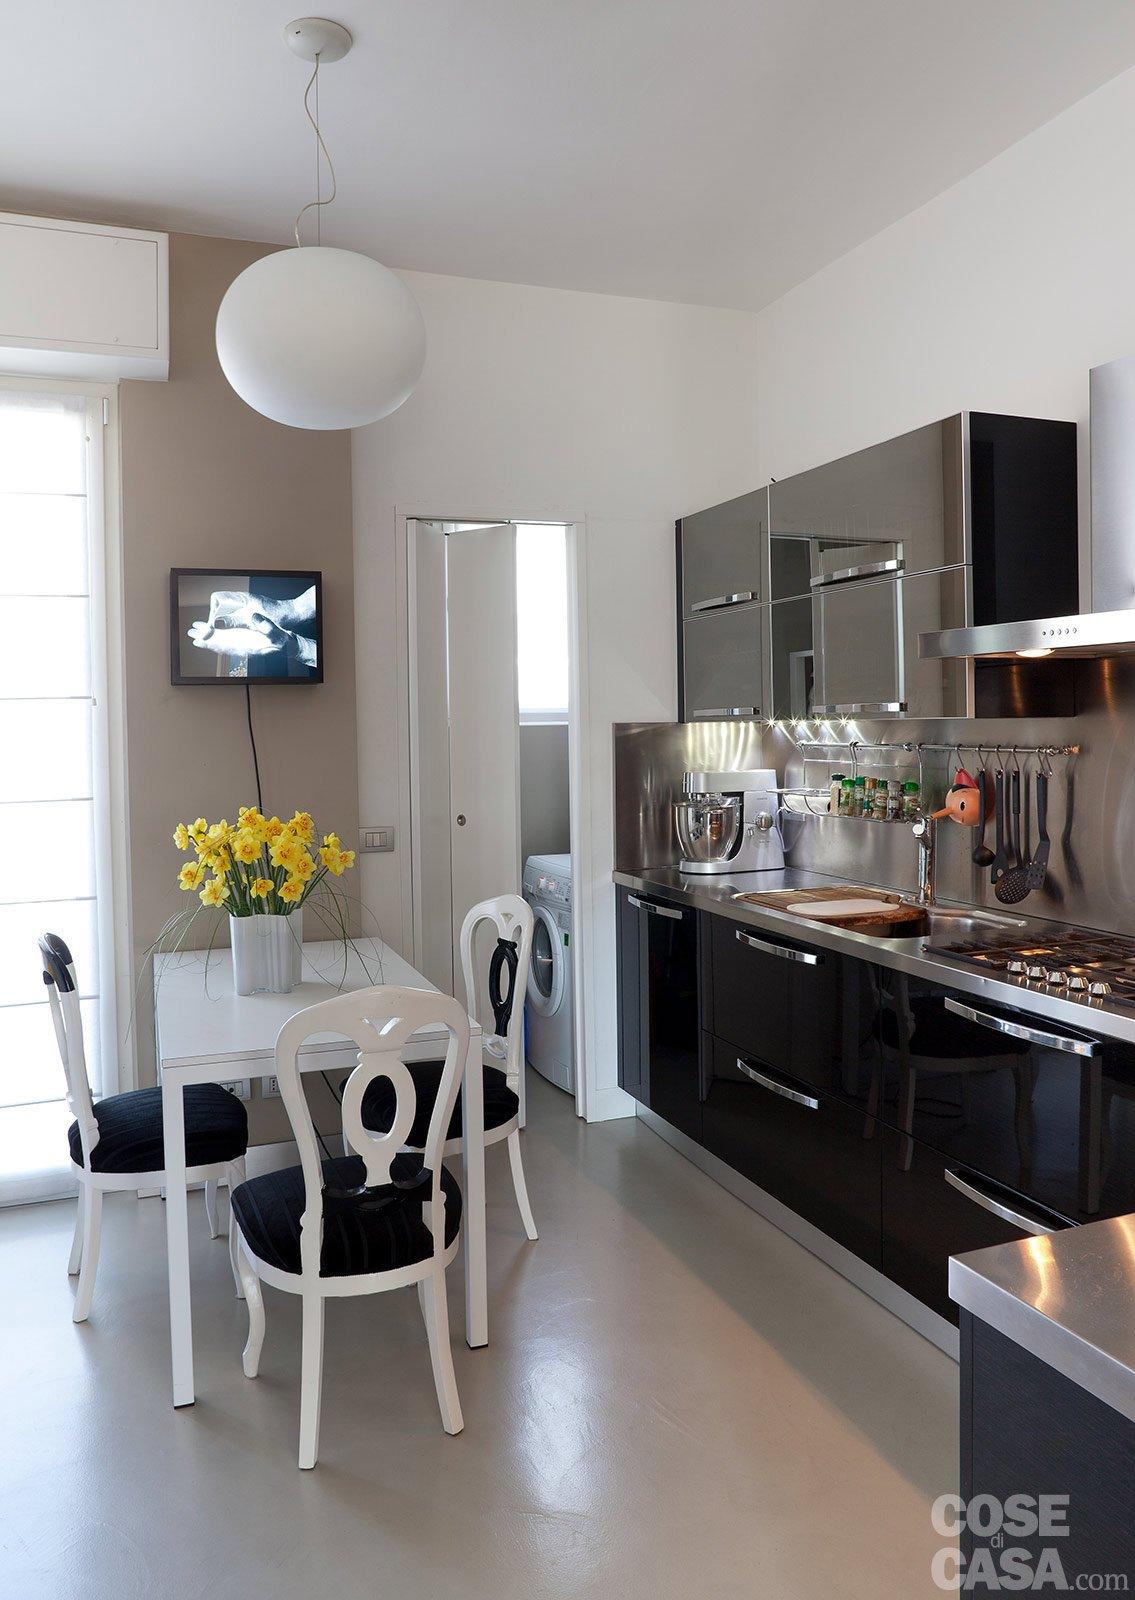 Tinteggiatura Parete Cucina: Tinteggiatura parete cucina foto pittura decorativa in di.